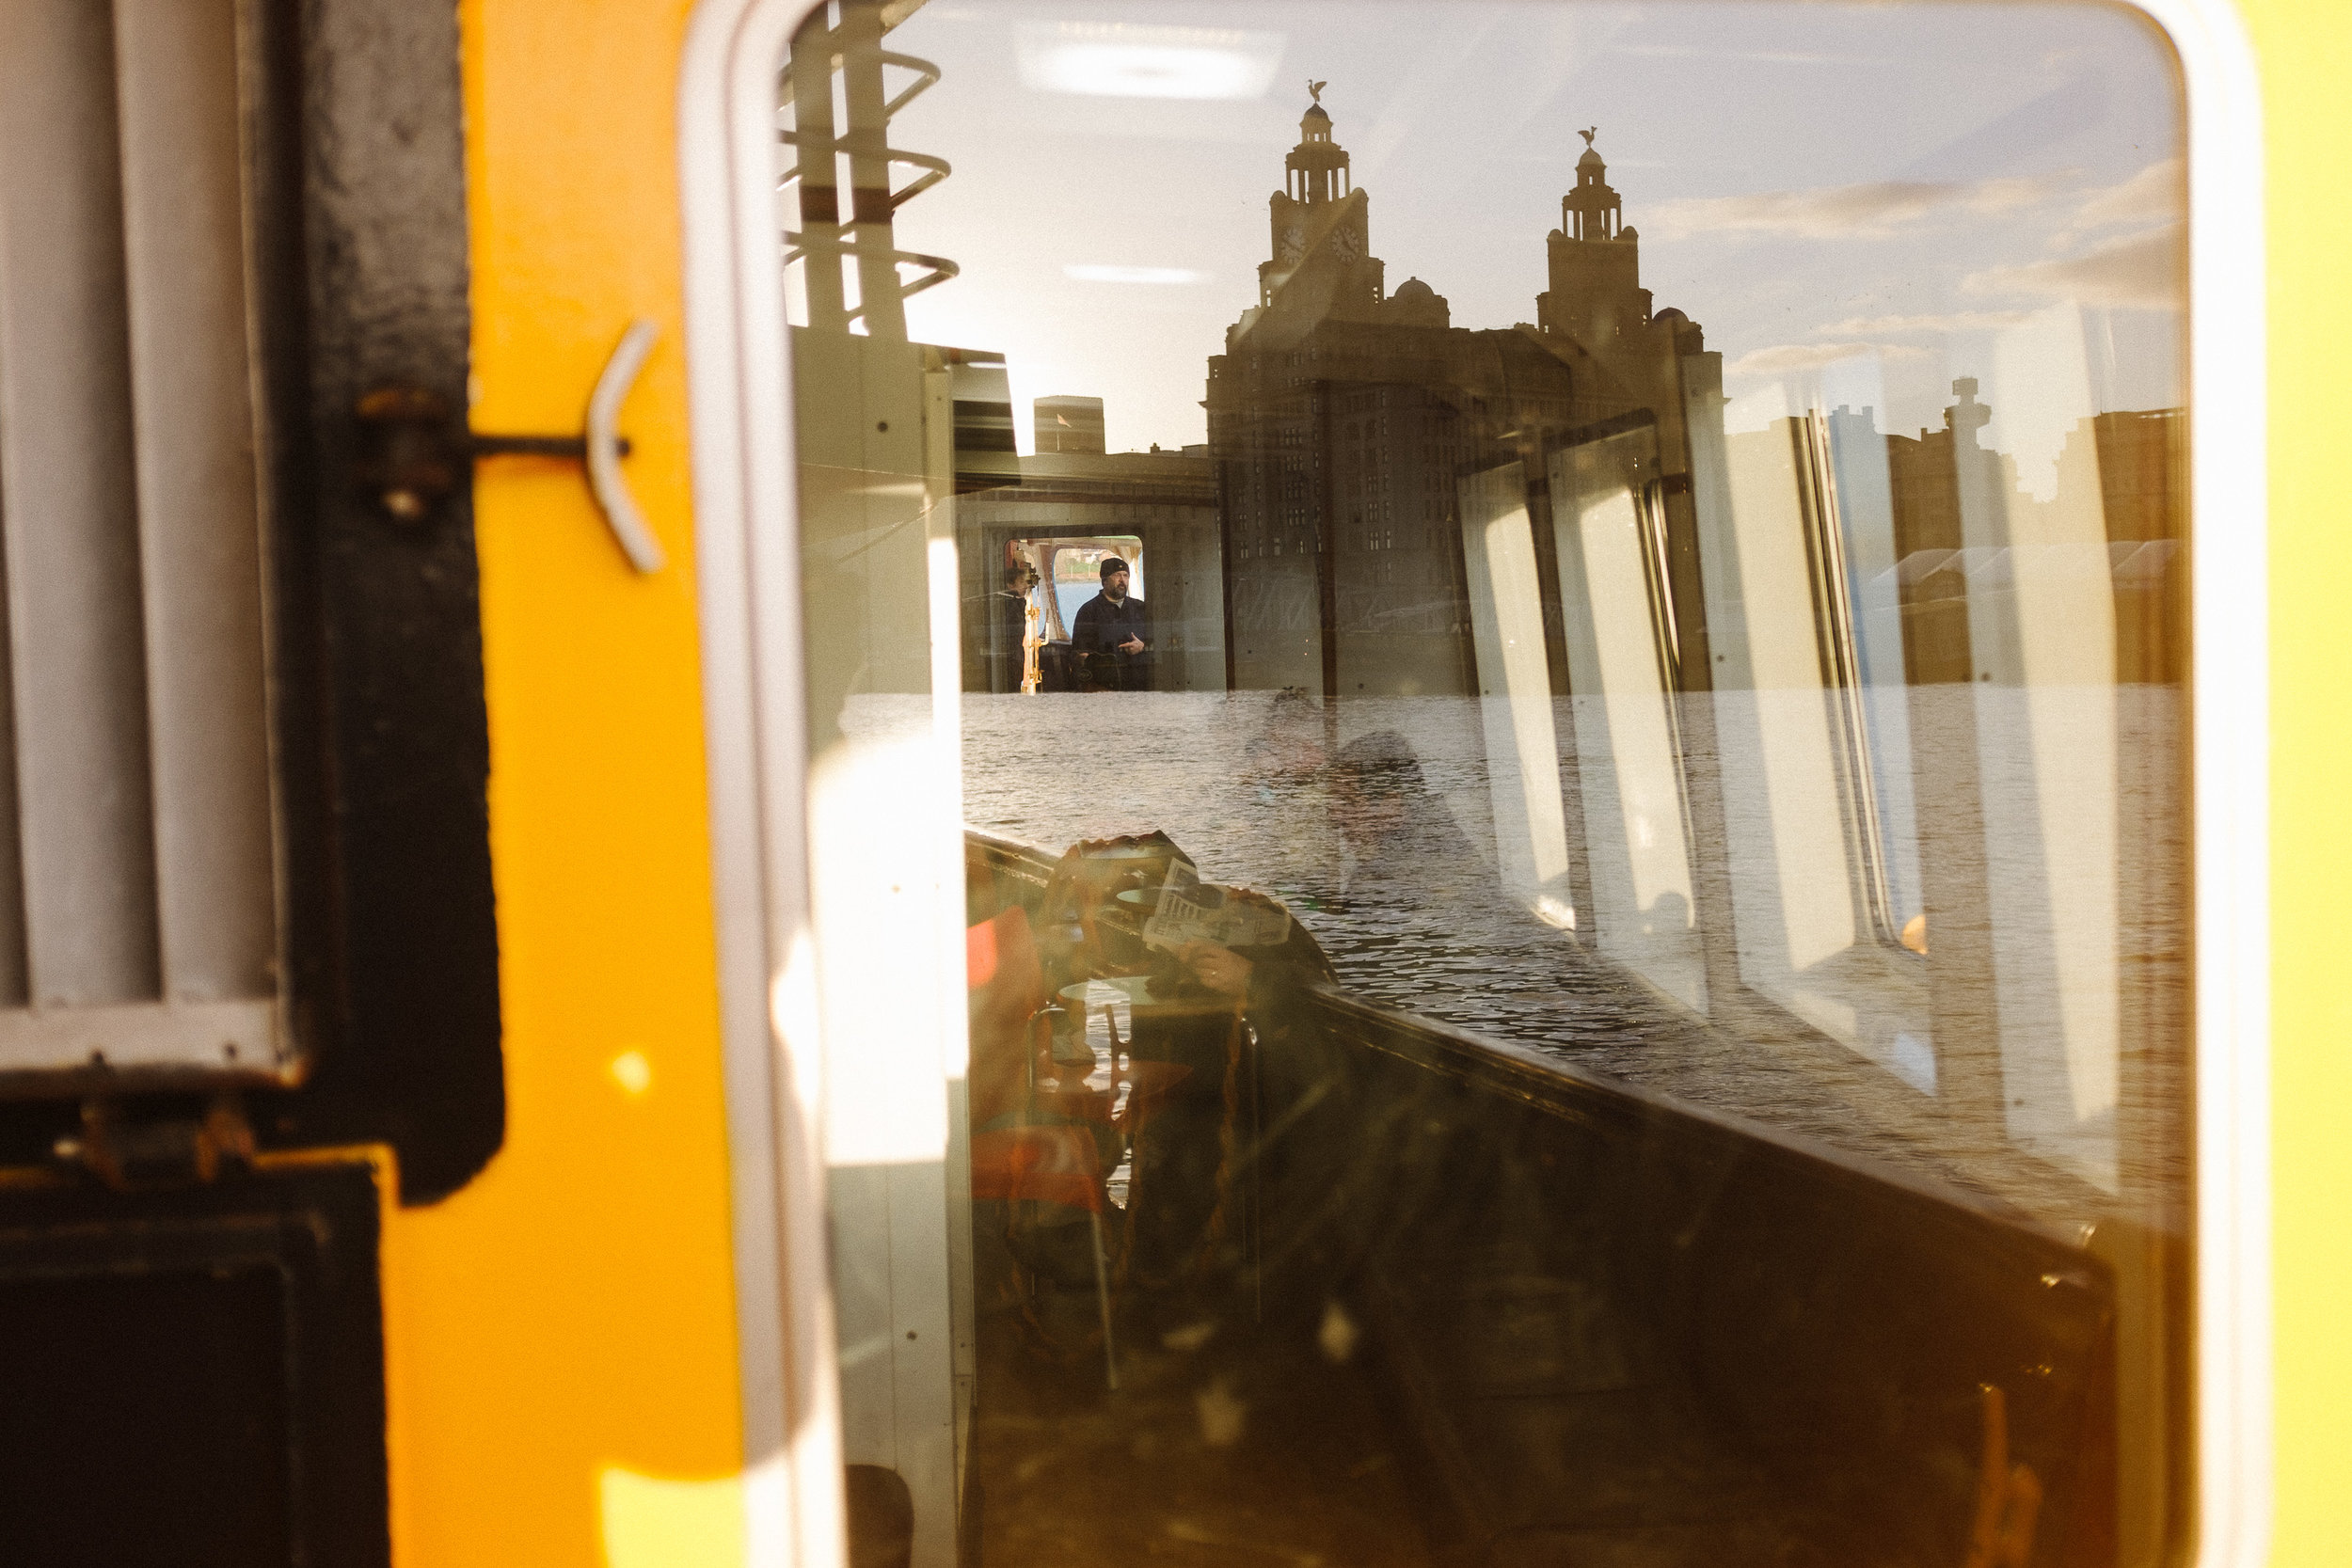 Ferry-1592-pete-carr.jpg